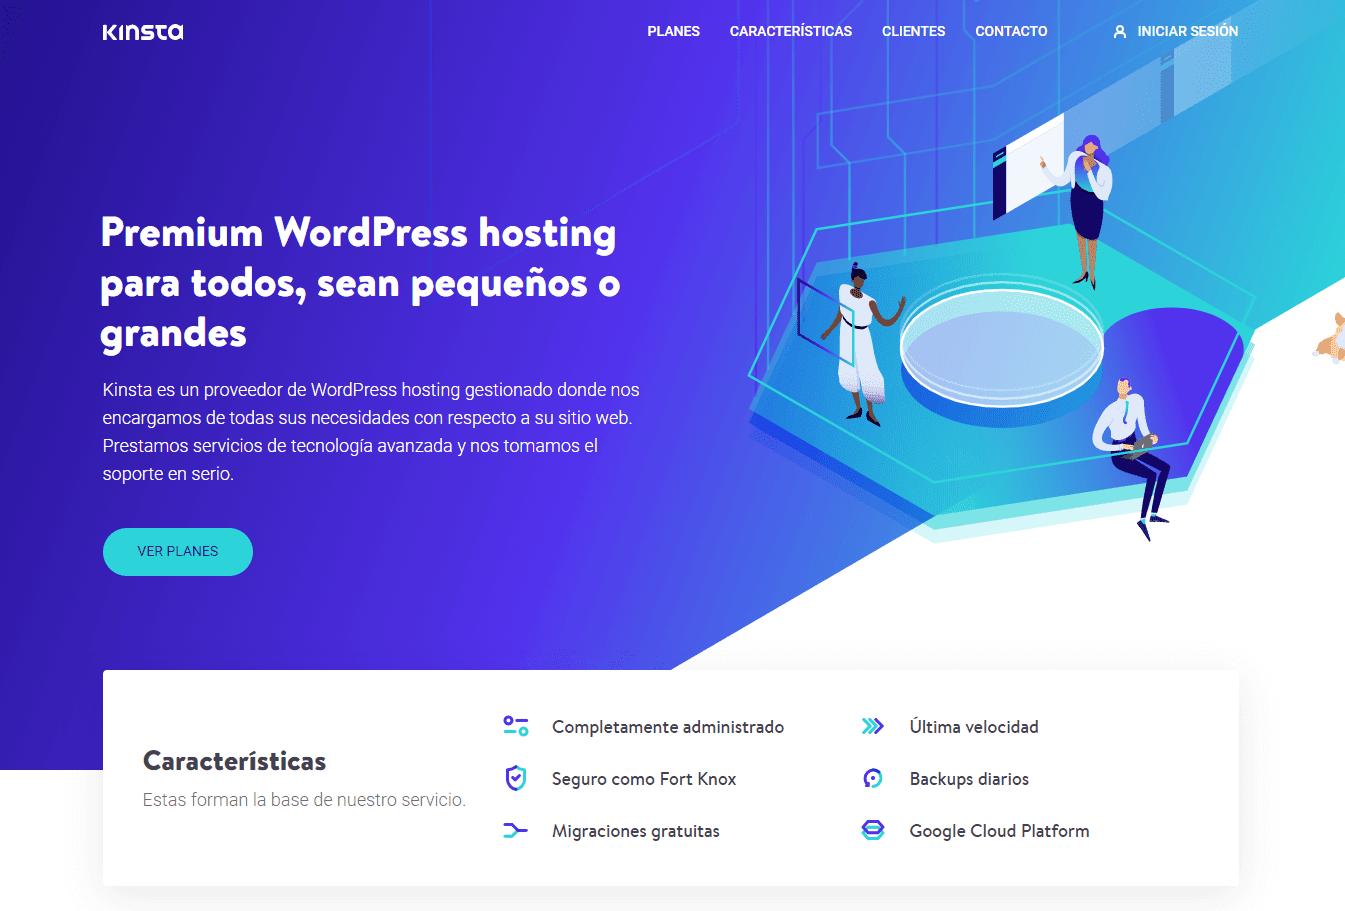 kinsta-website-spanish-1